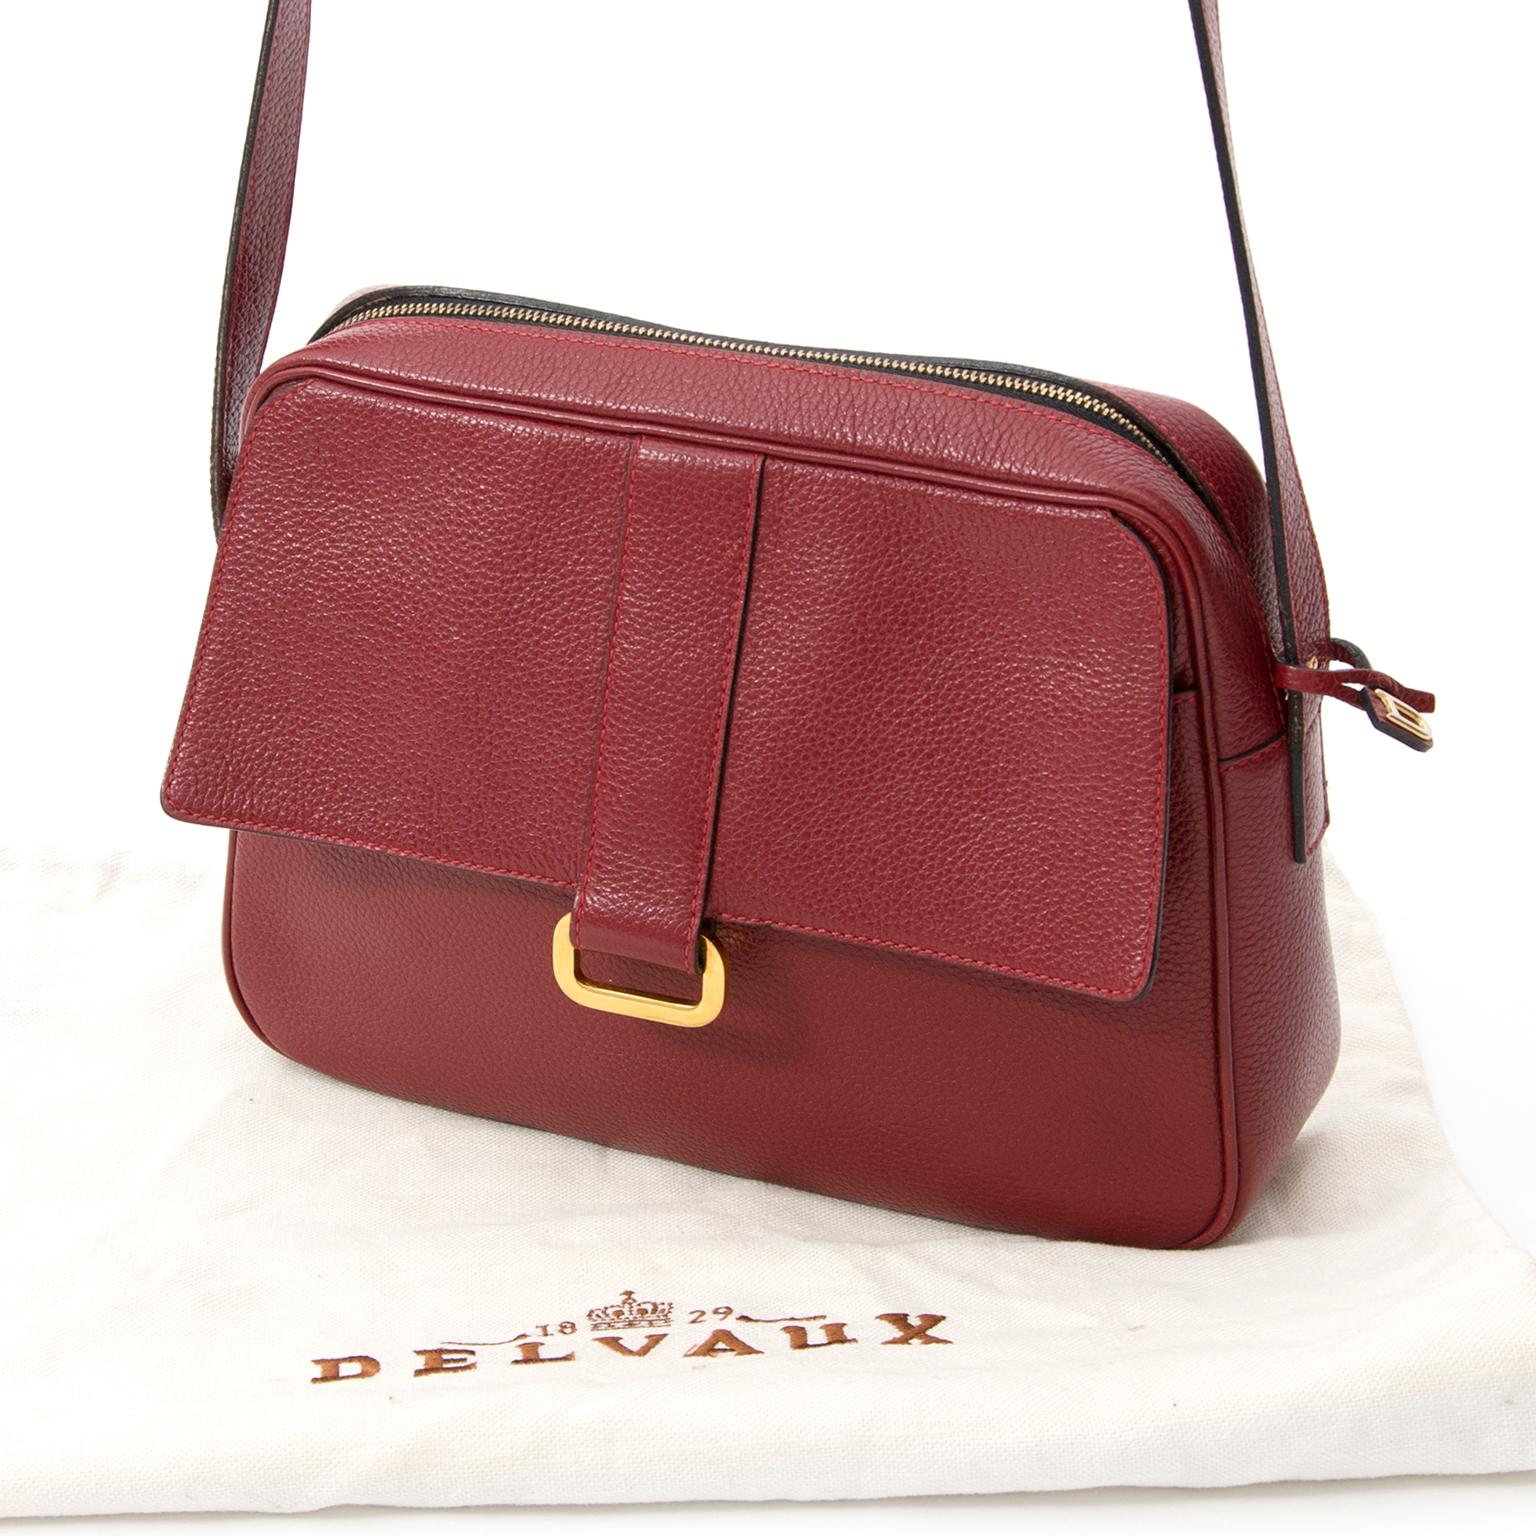 Luxury Delvaux handbag brand exclusively at Labellov